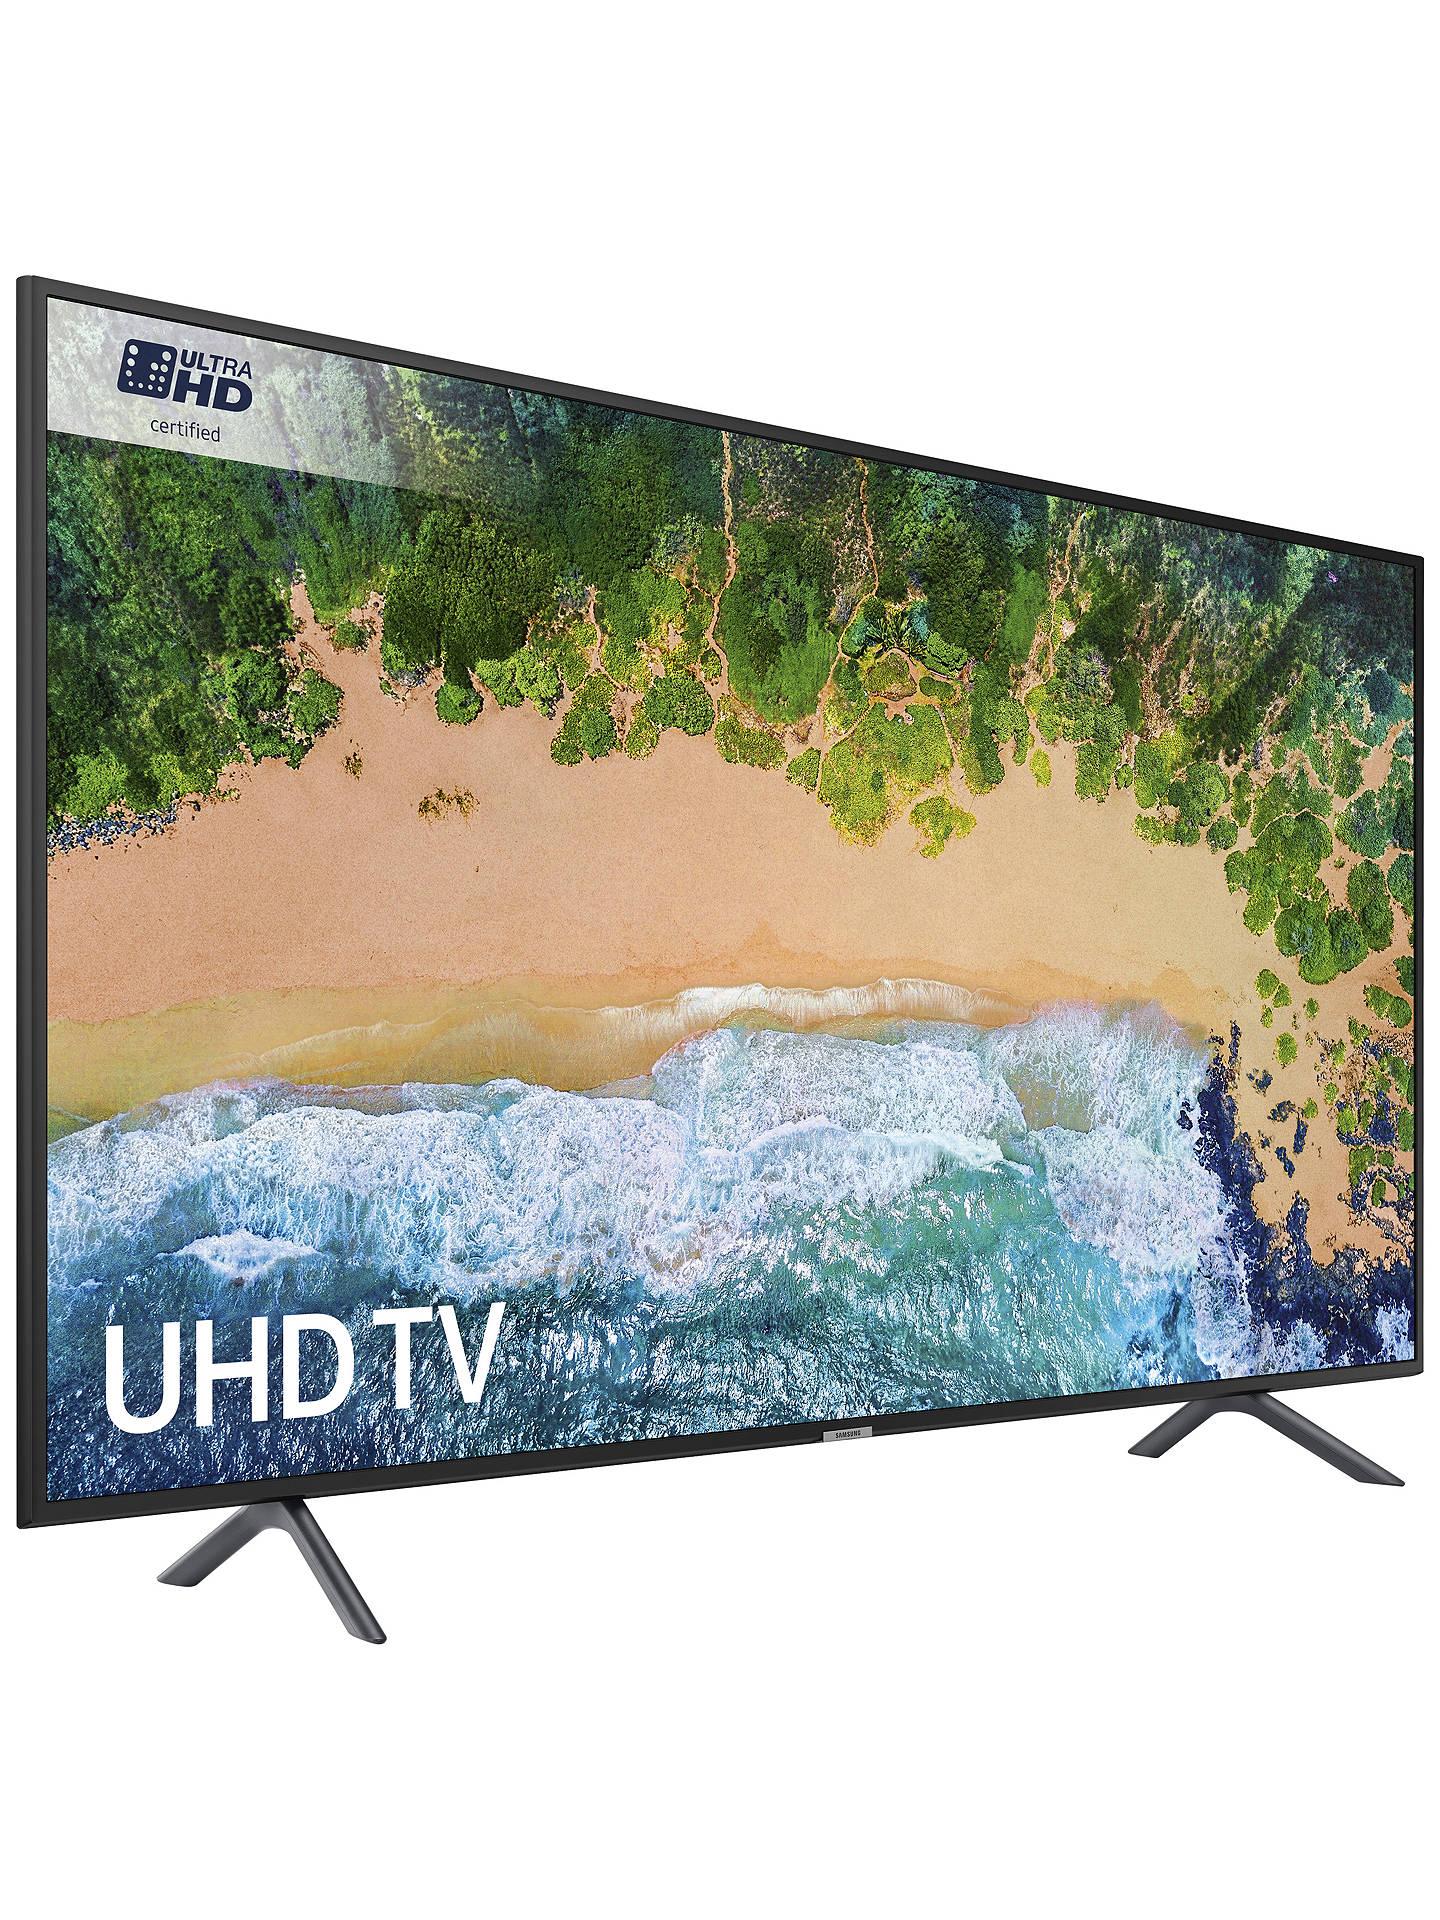 "Samsung UE65NU7100 HDR 4K Ultra HD 65"" £699 @ John Lewis & Partners"